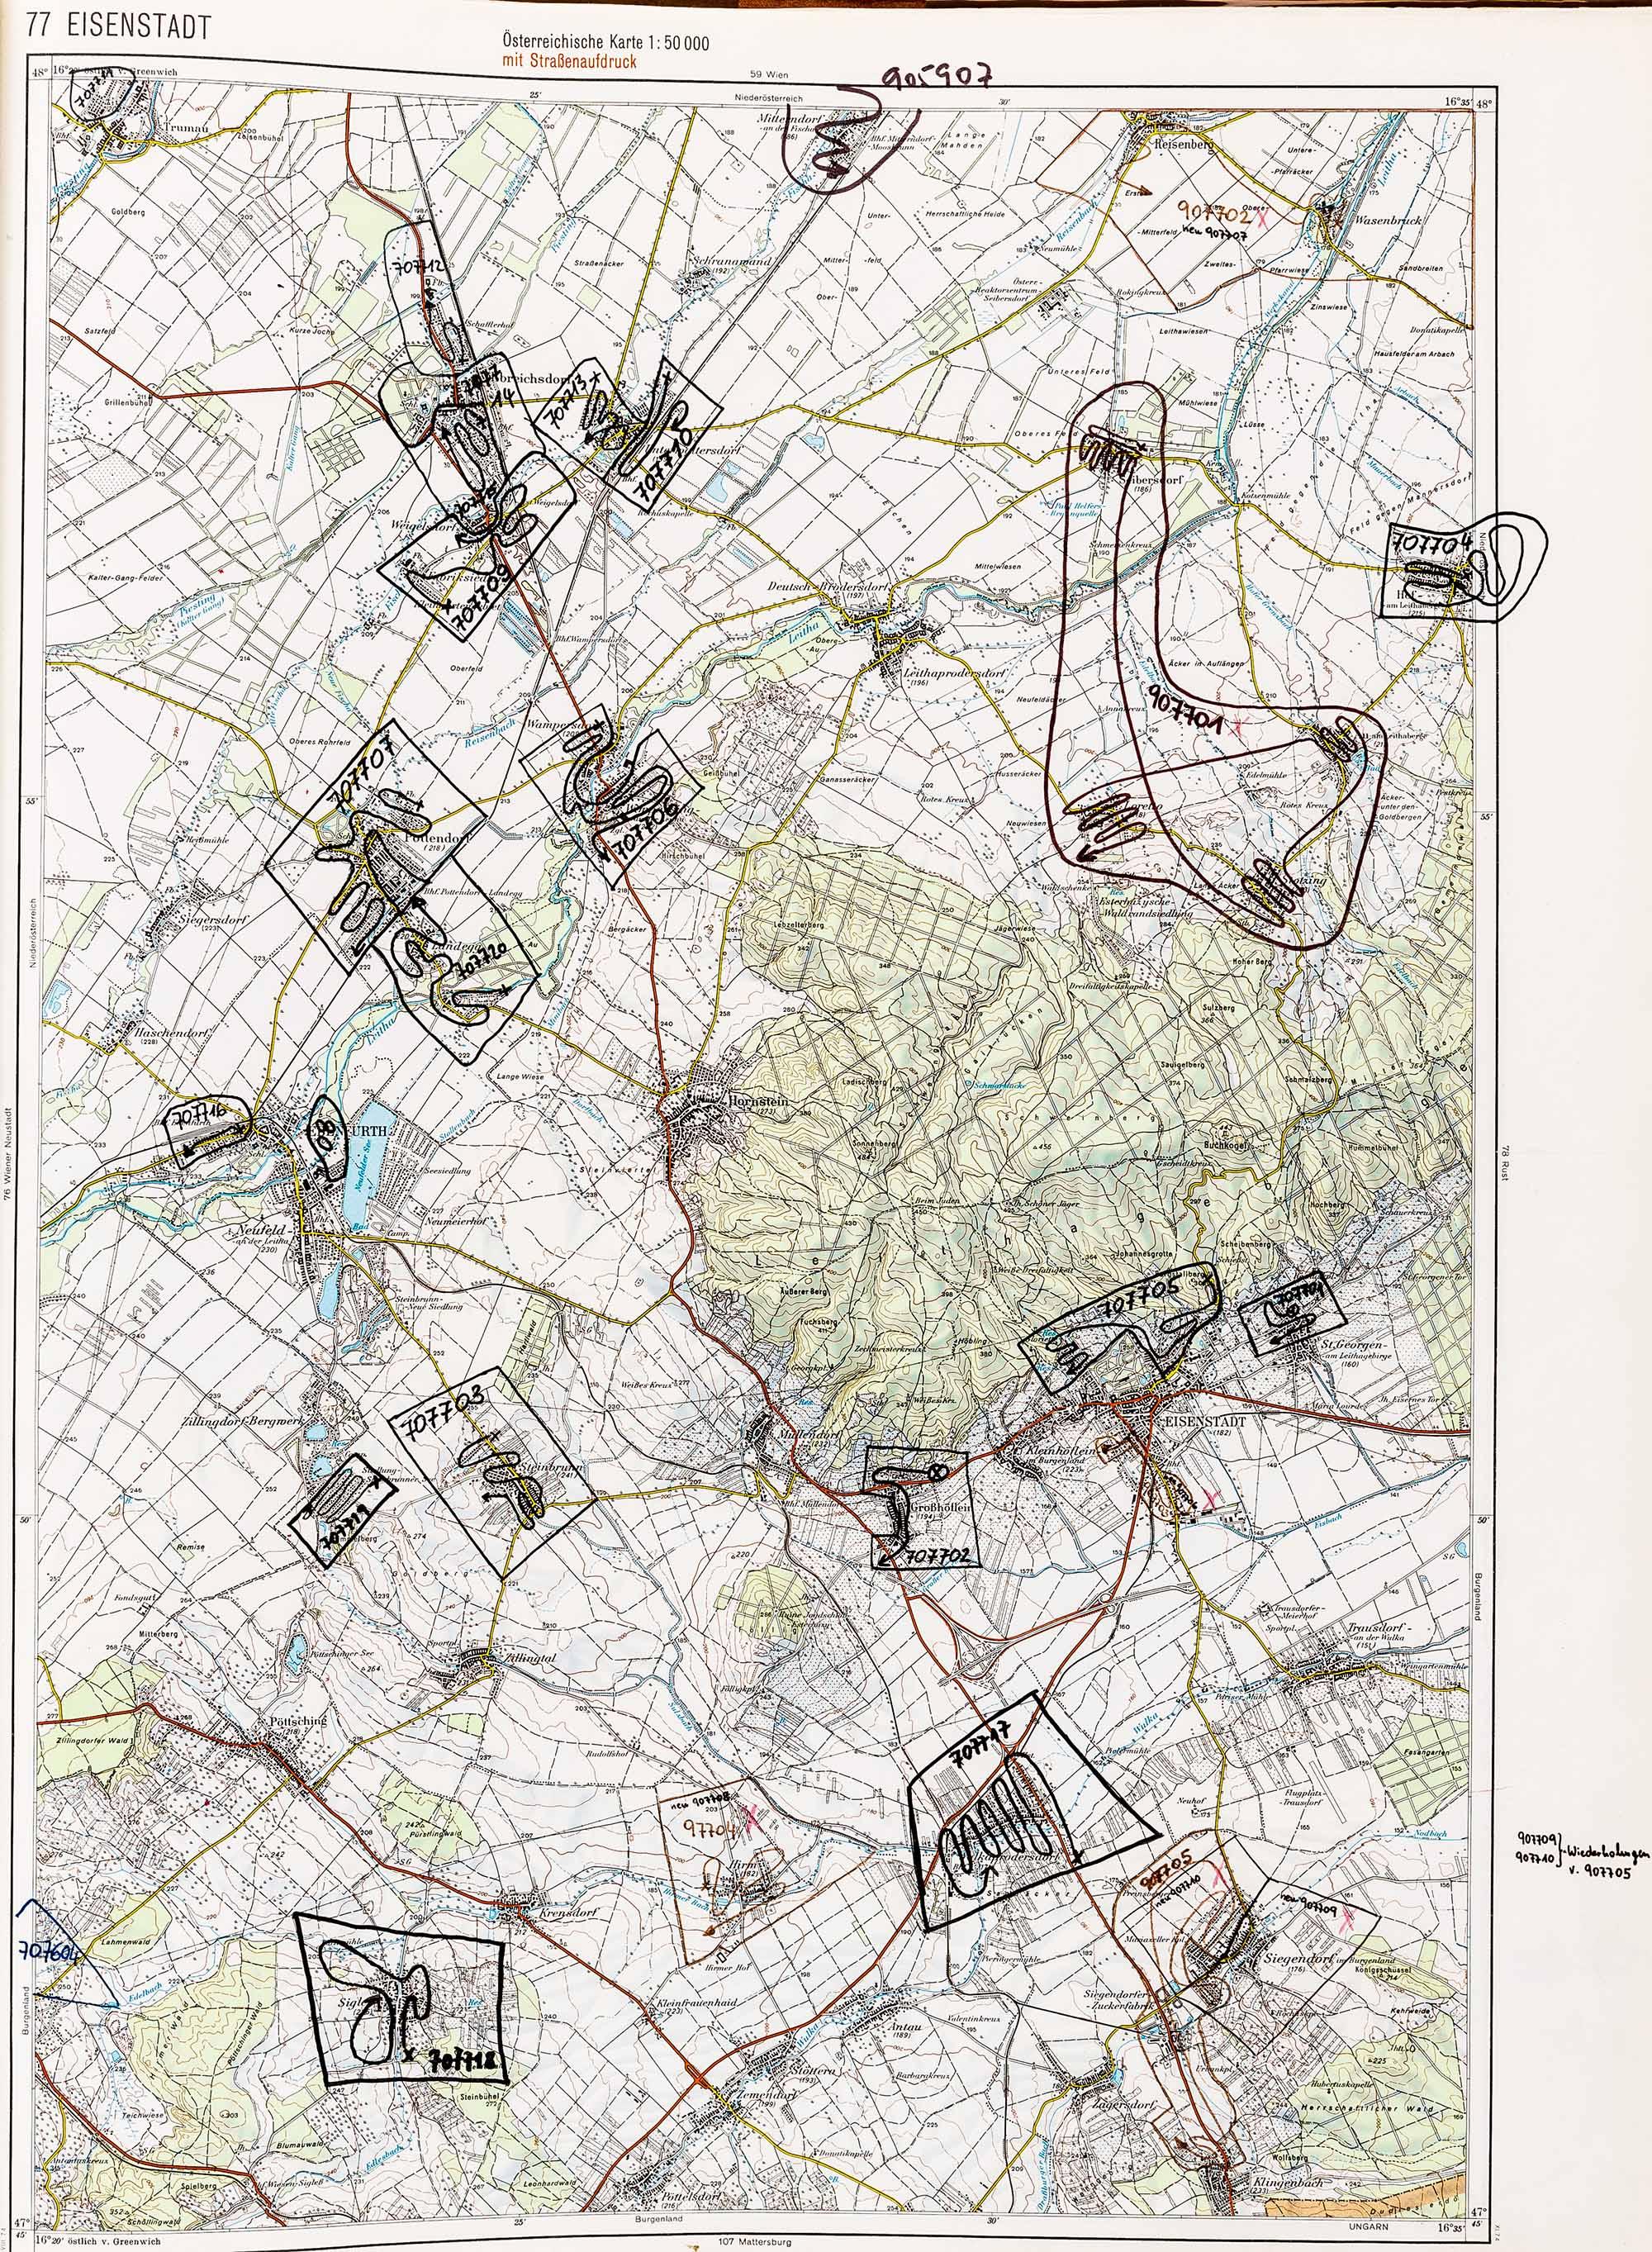 1975-1979 Karte 077